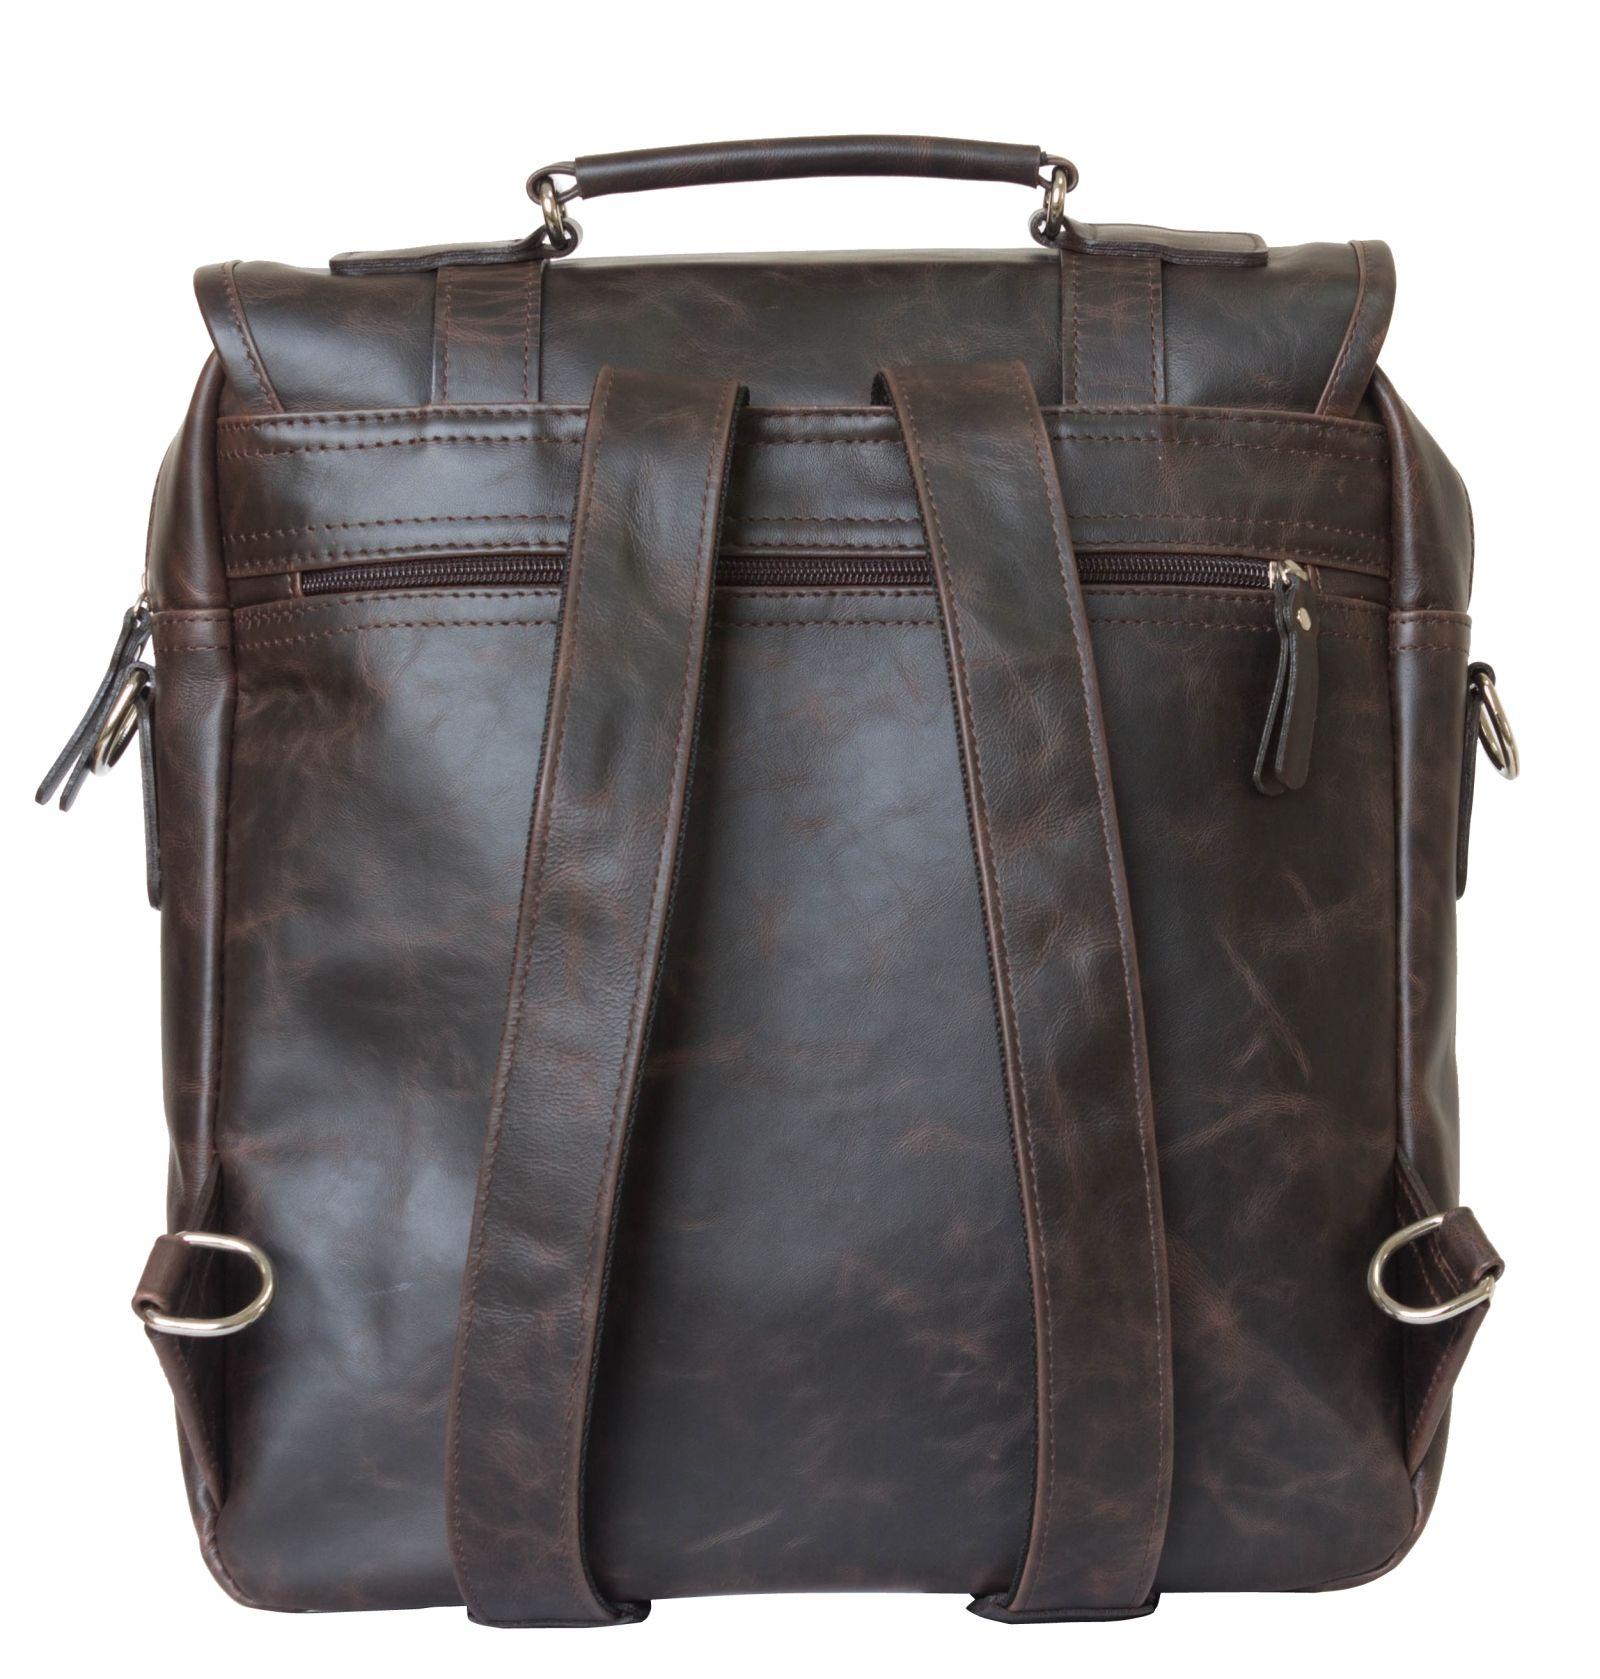 ab8f46b55b7c Универсальная сумка BRIALDI Somo (Сомо) black. Кожаная сумка-рюкзак Carlo  Gattini Tronto brown. ‹ ›